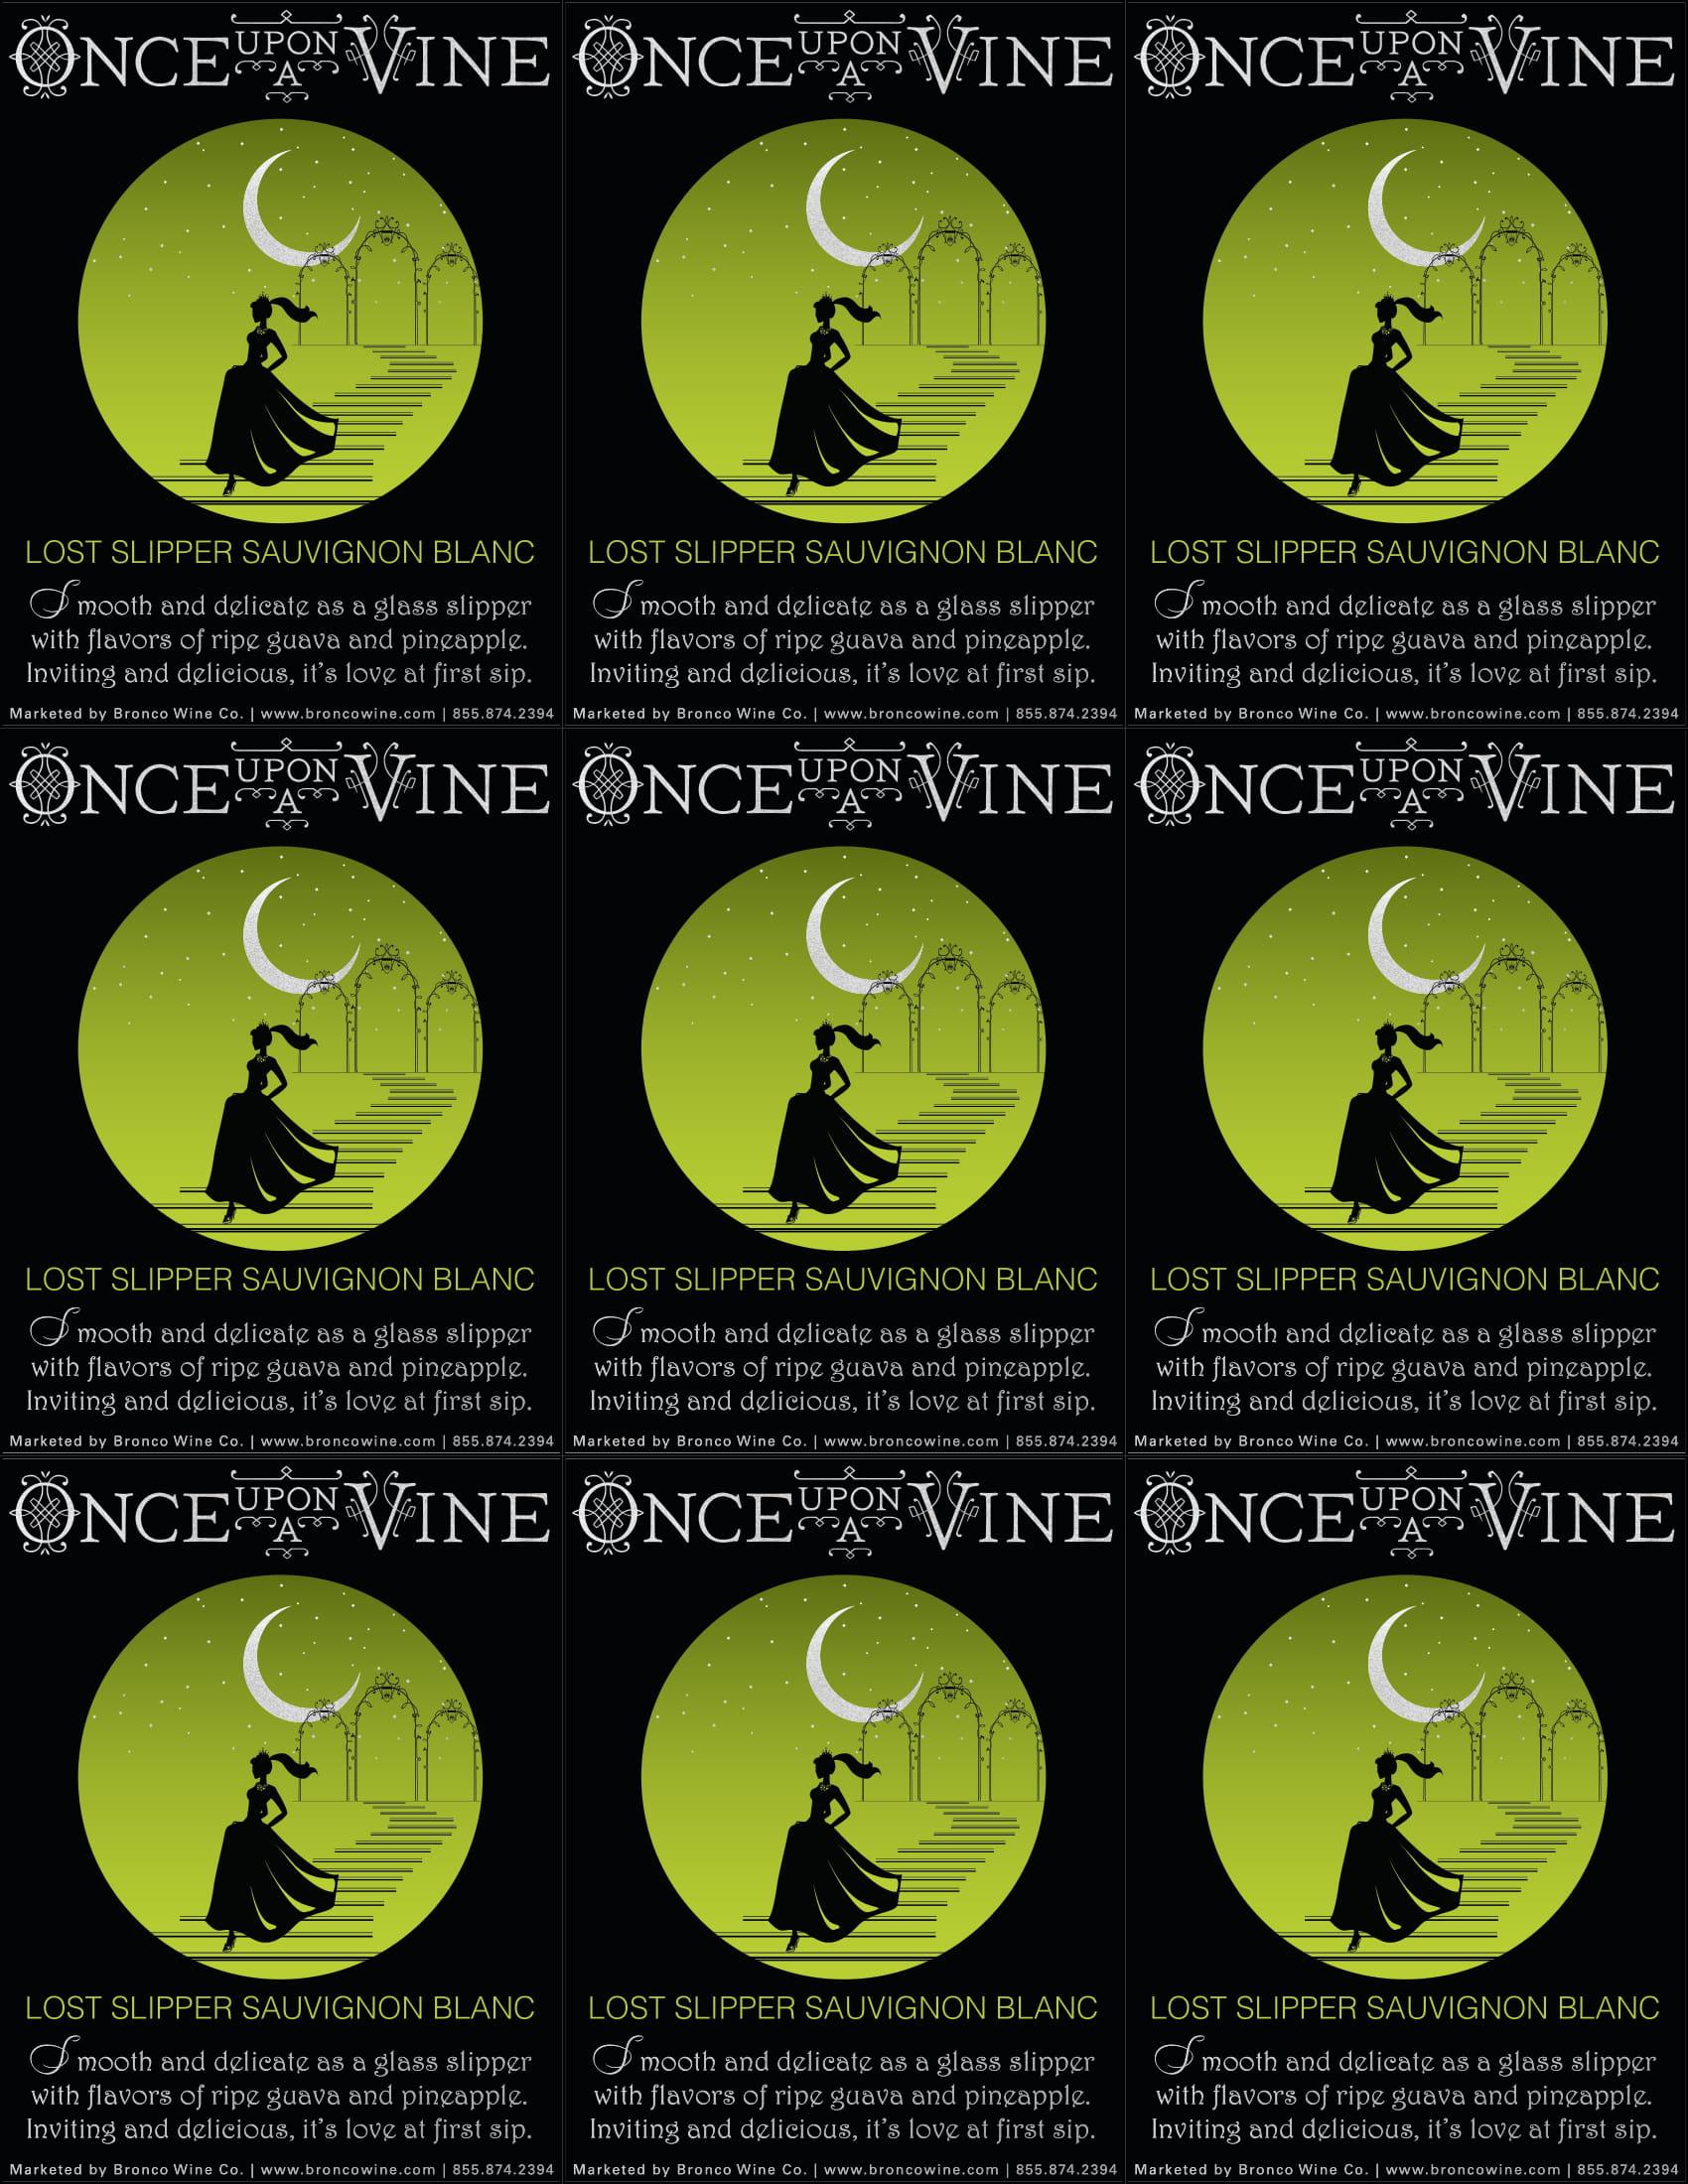 Once Upon A Vine Lost Slipper Sauvignon Blanc Shelf Talker